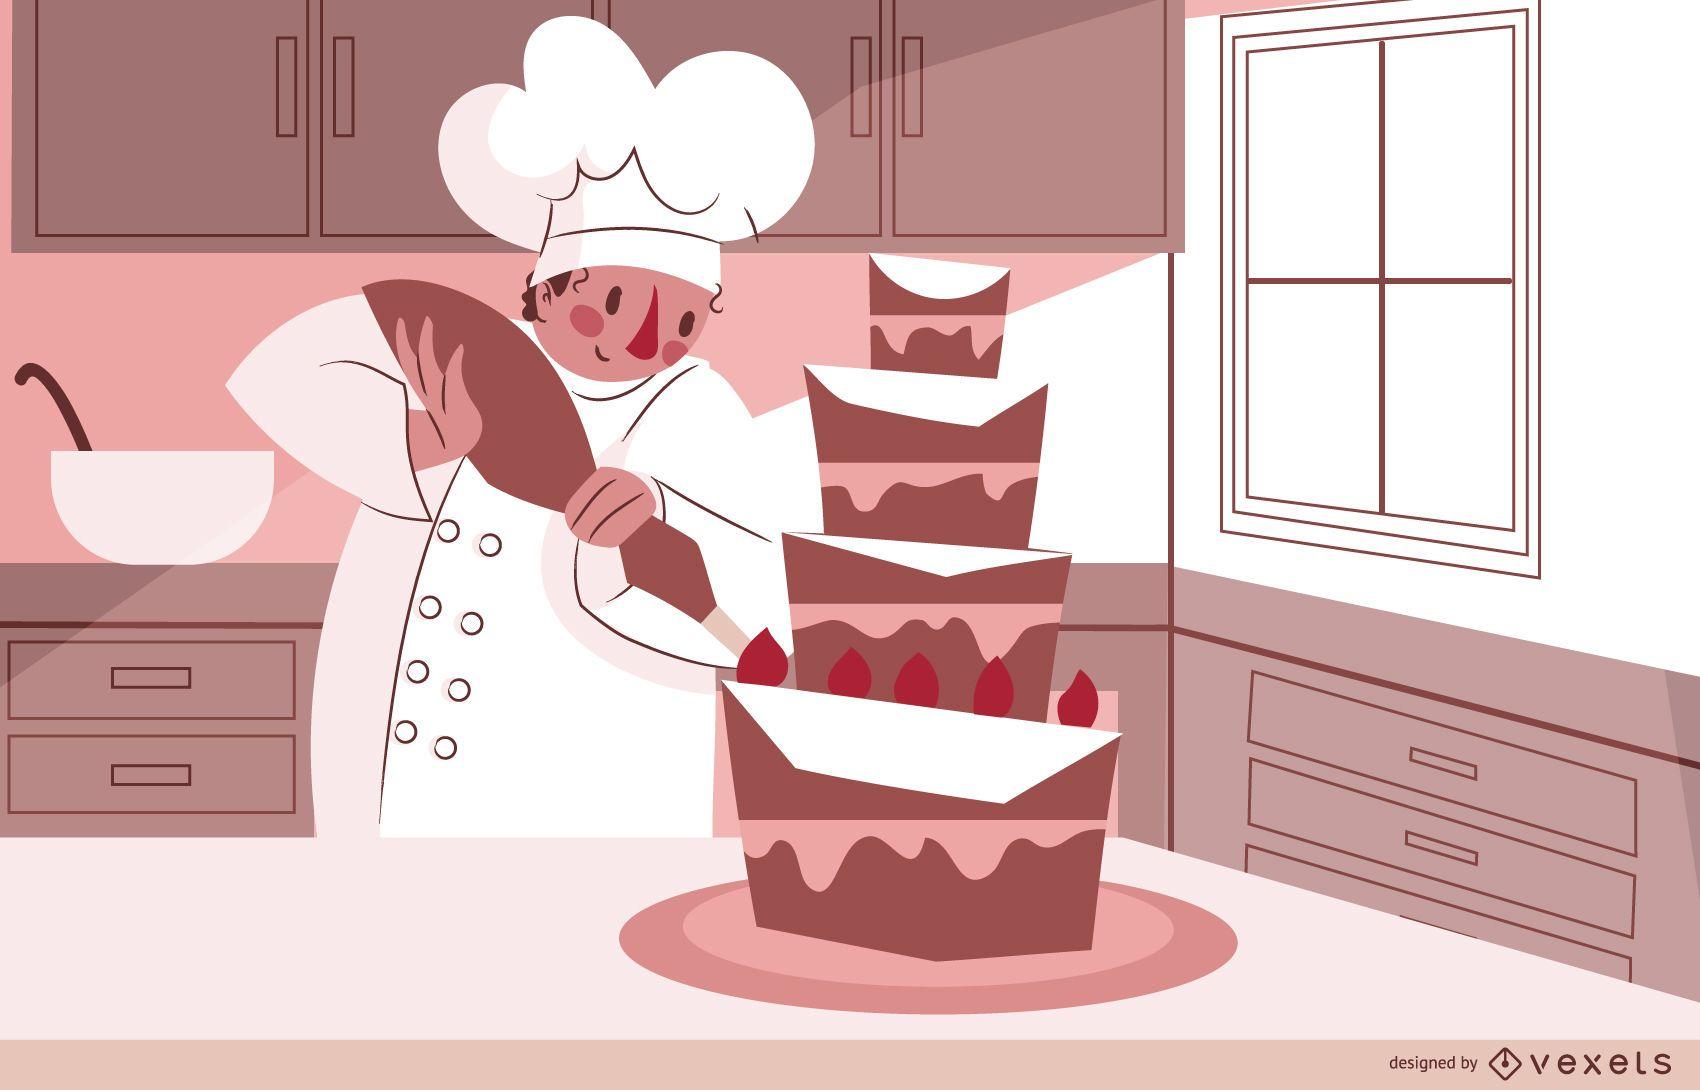 Pastry Chef Cake Illustration Design